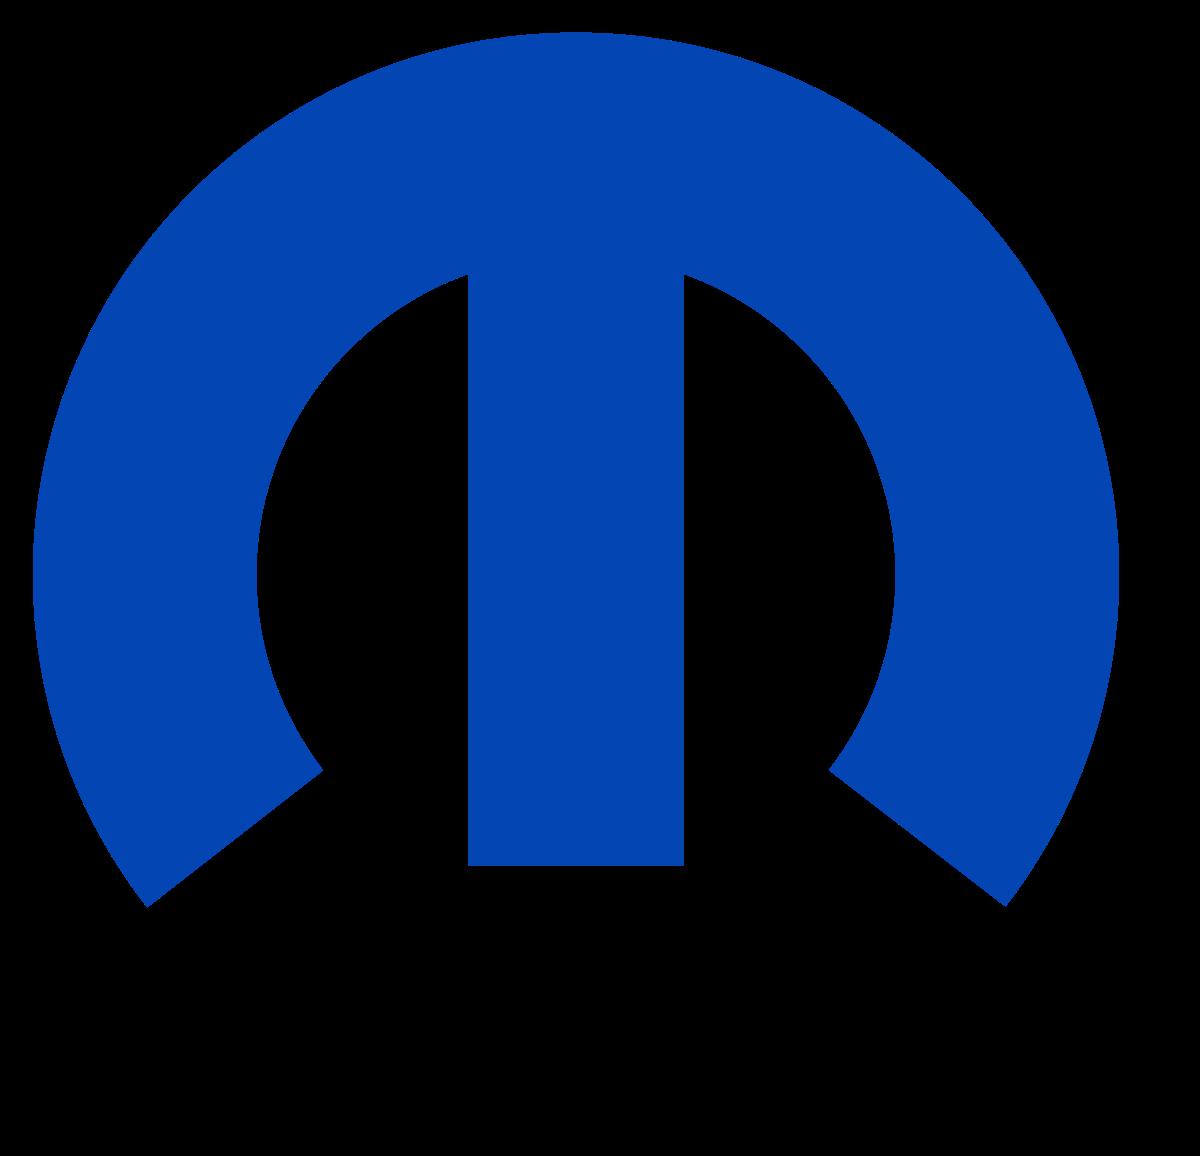 www.moparpartsoutletdirect.com